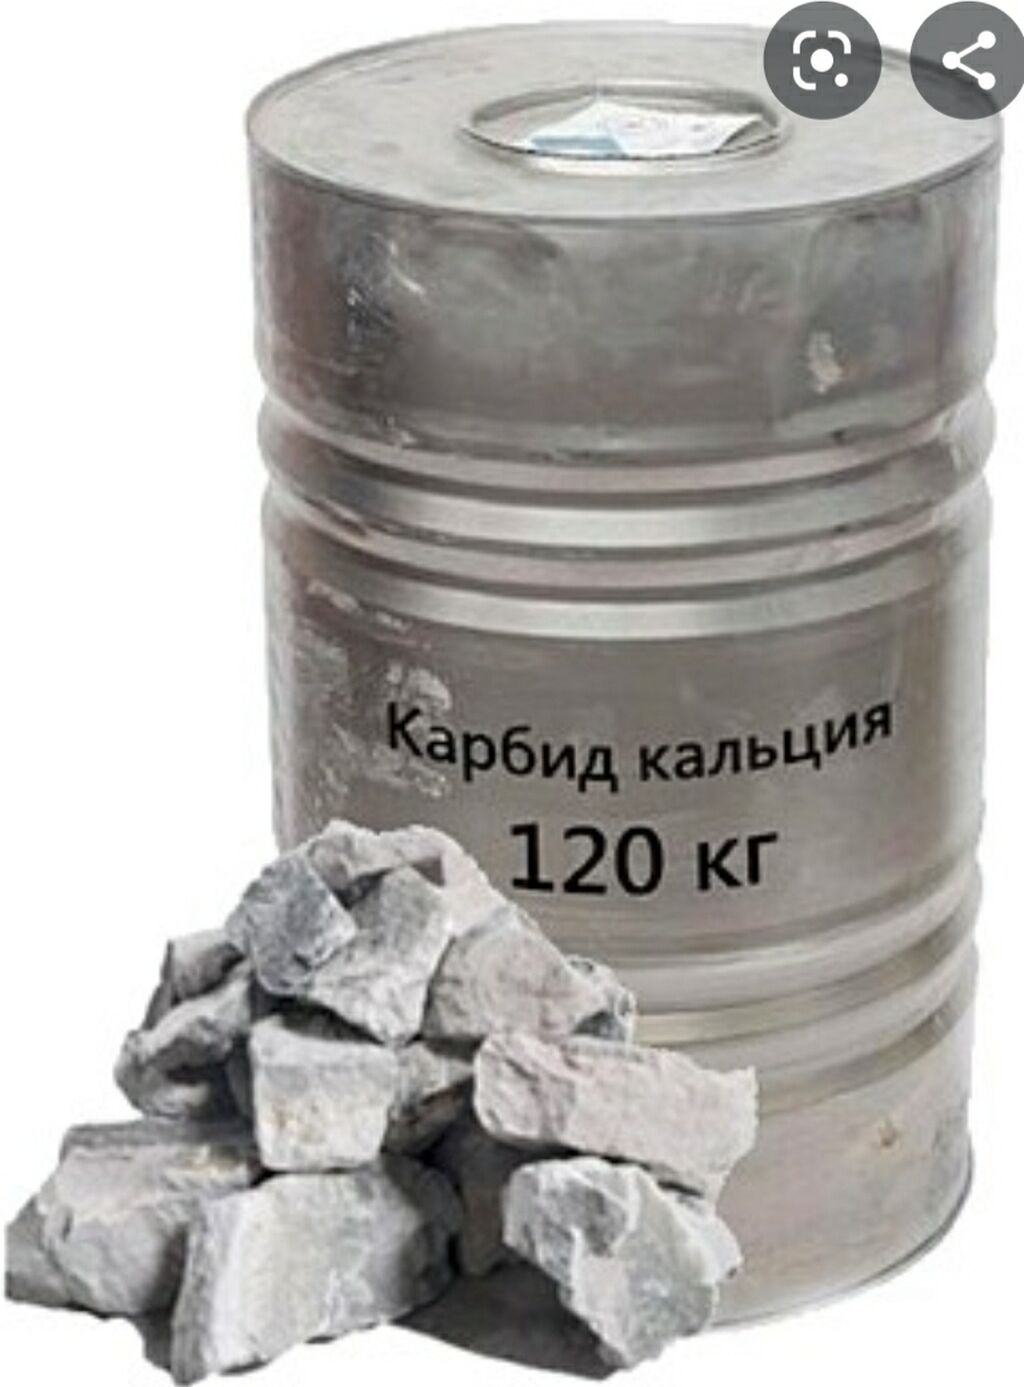 Карбид. Оптом и в розницу. Бочки по 125 кг. Производство -Казахстан: Карбид. Оптом и в розницу. Бочки по 125 кг. Производство -Казахстан